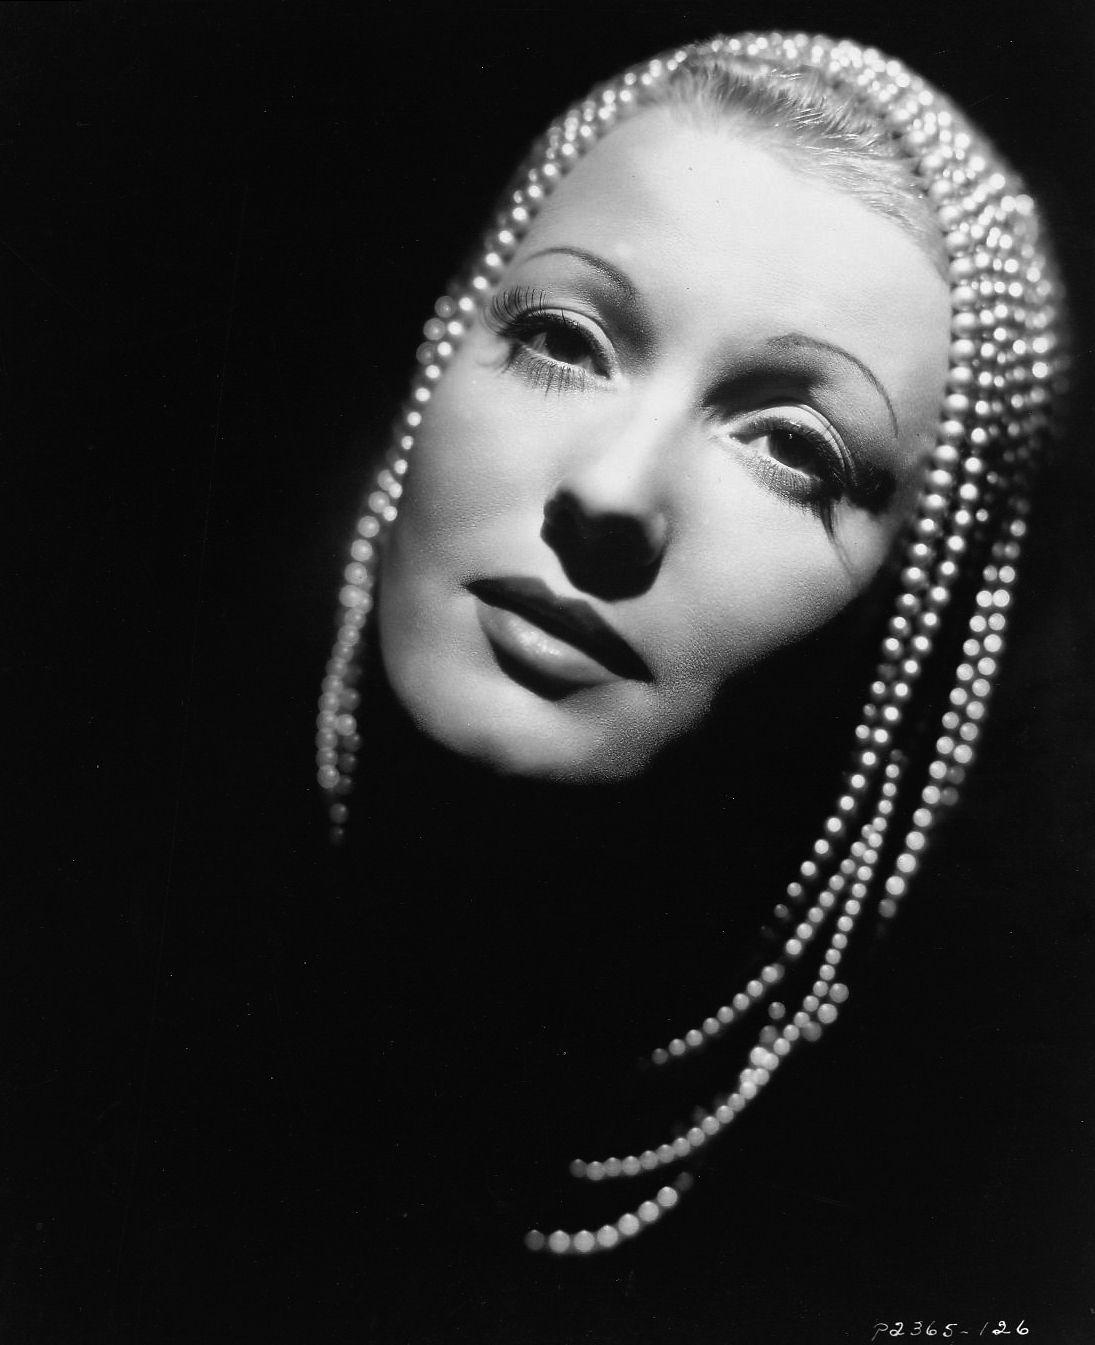 isa miranda vera bergman creepy vintage photography 30s 40s fashion hisotry italian fascist divas the lux on actress